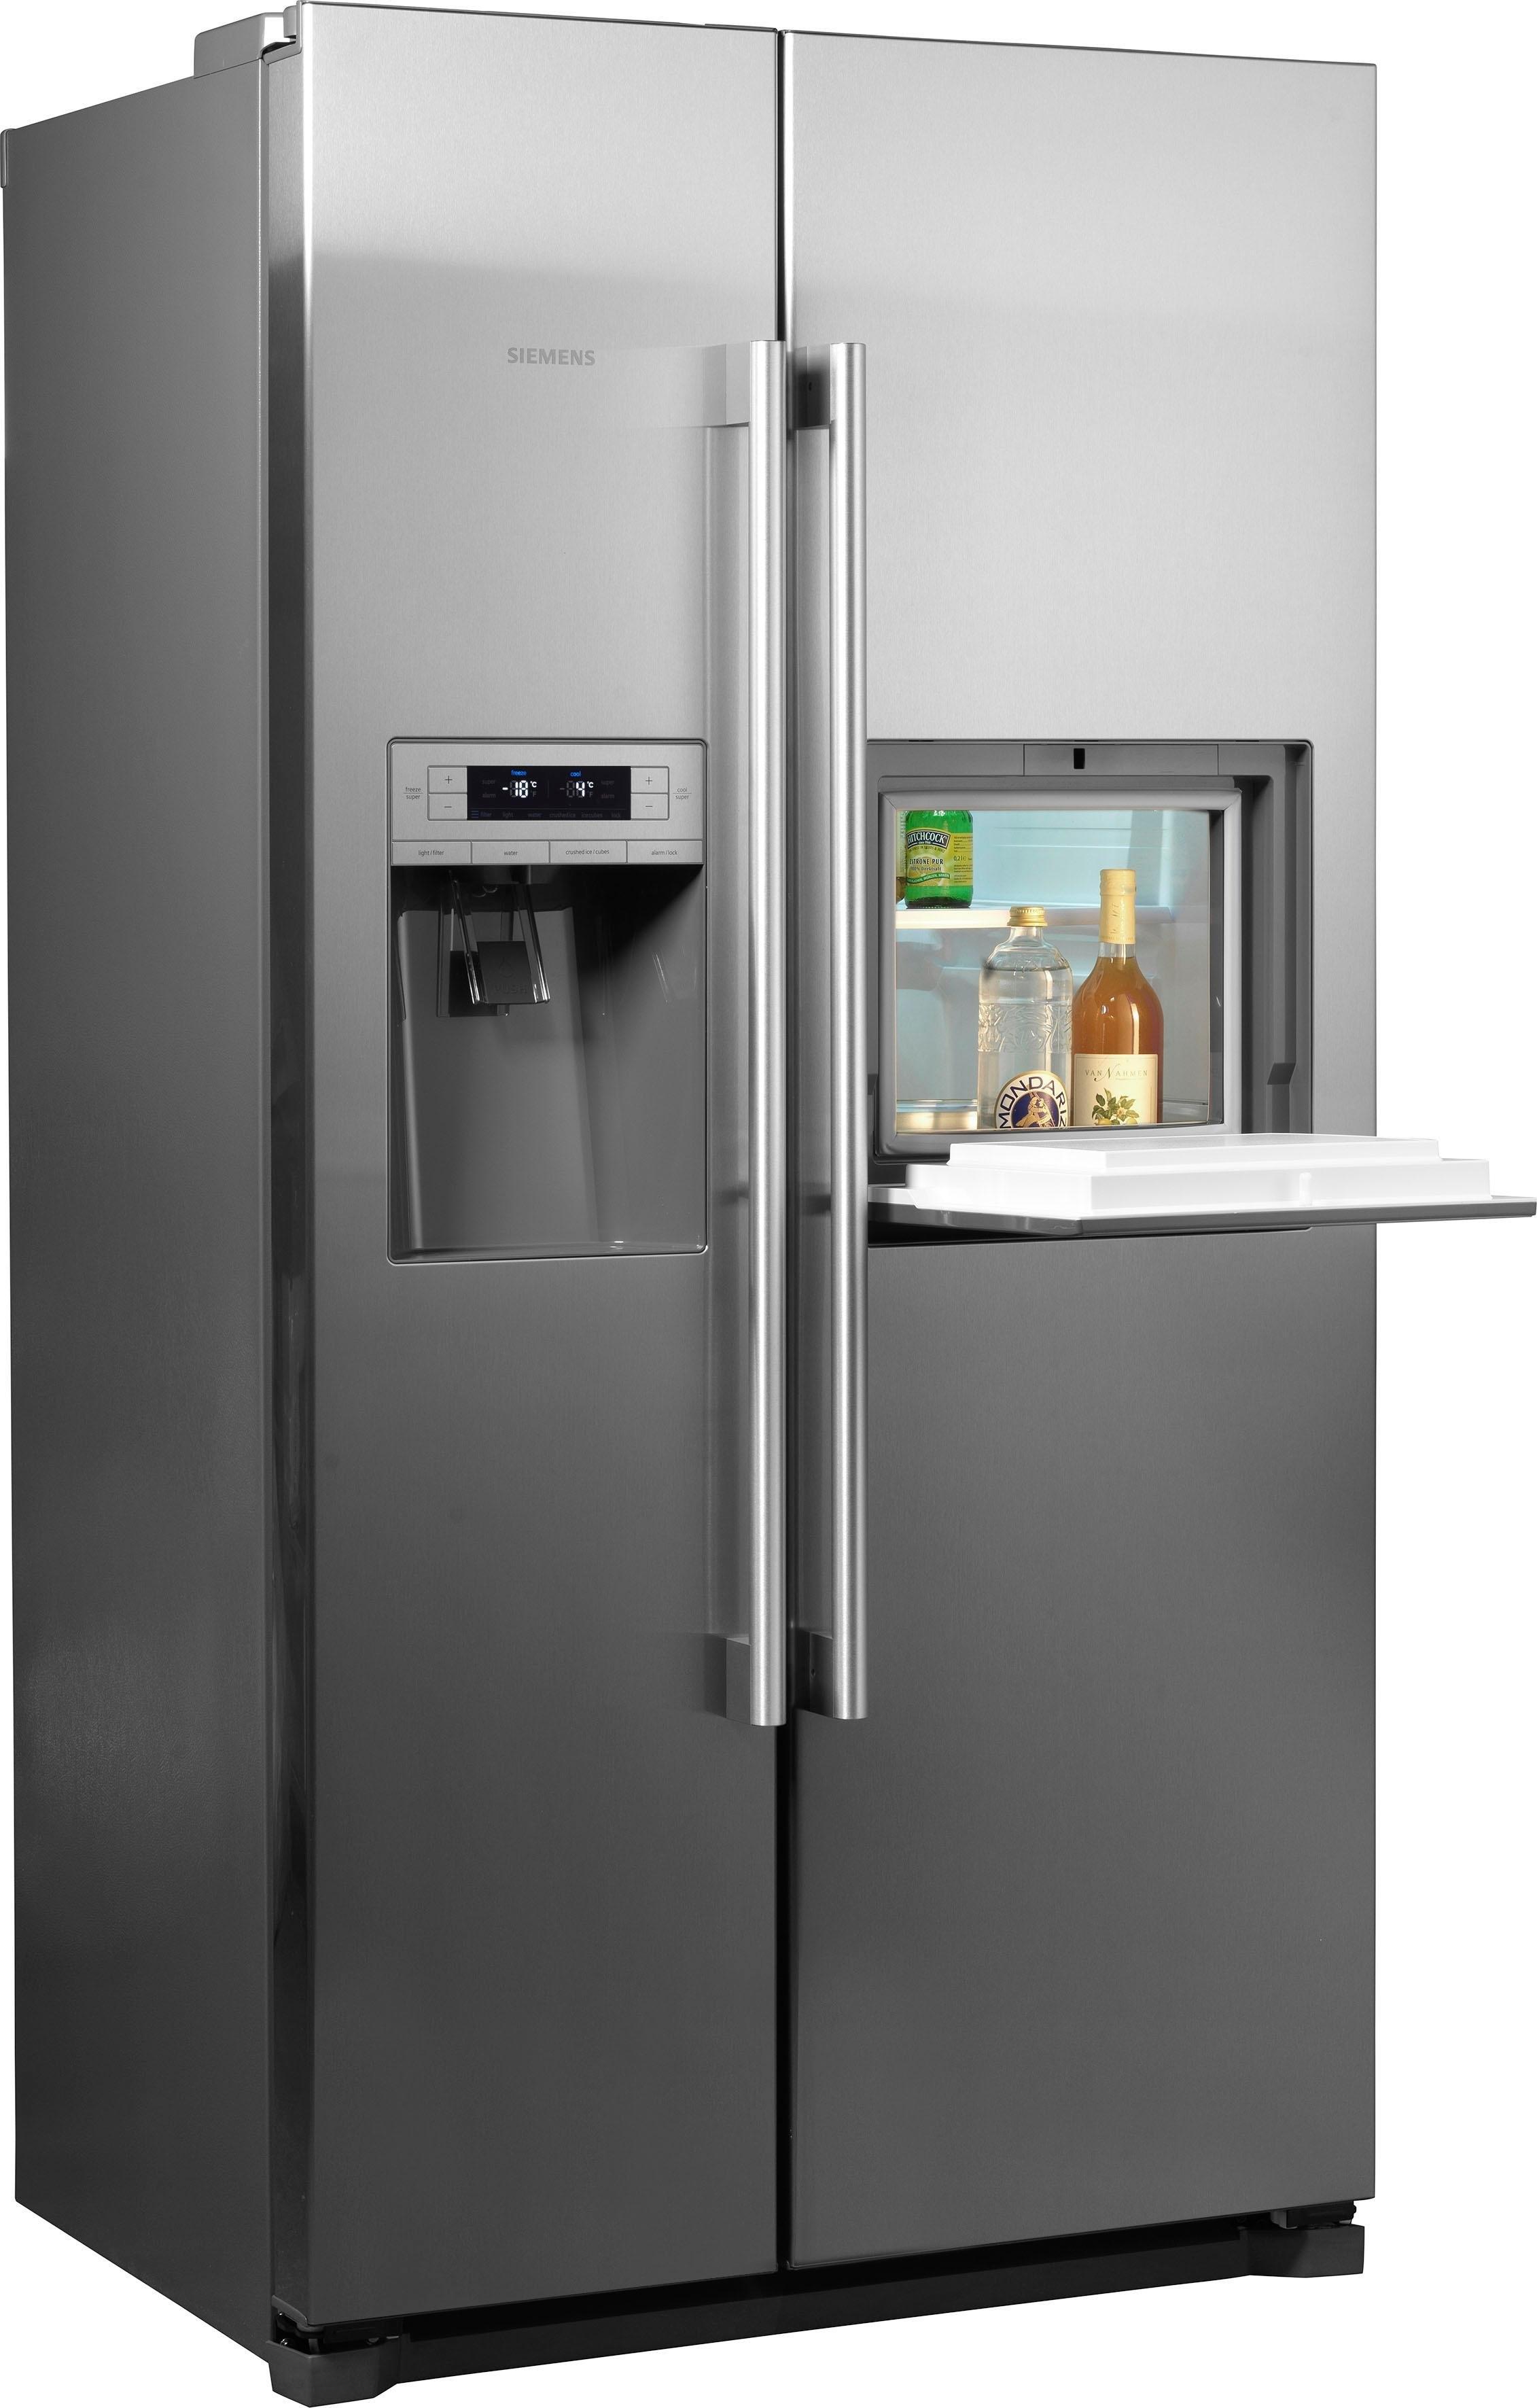 Siemens side-by-side-koelkast KA90GAI20, A+, 177 cm hoog, No Frost goedkoop op otto.nl kopen